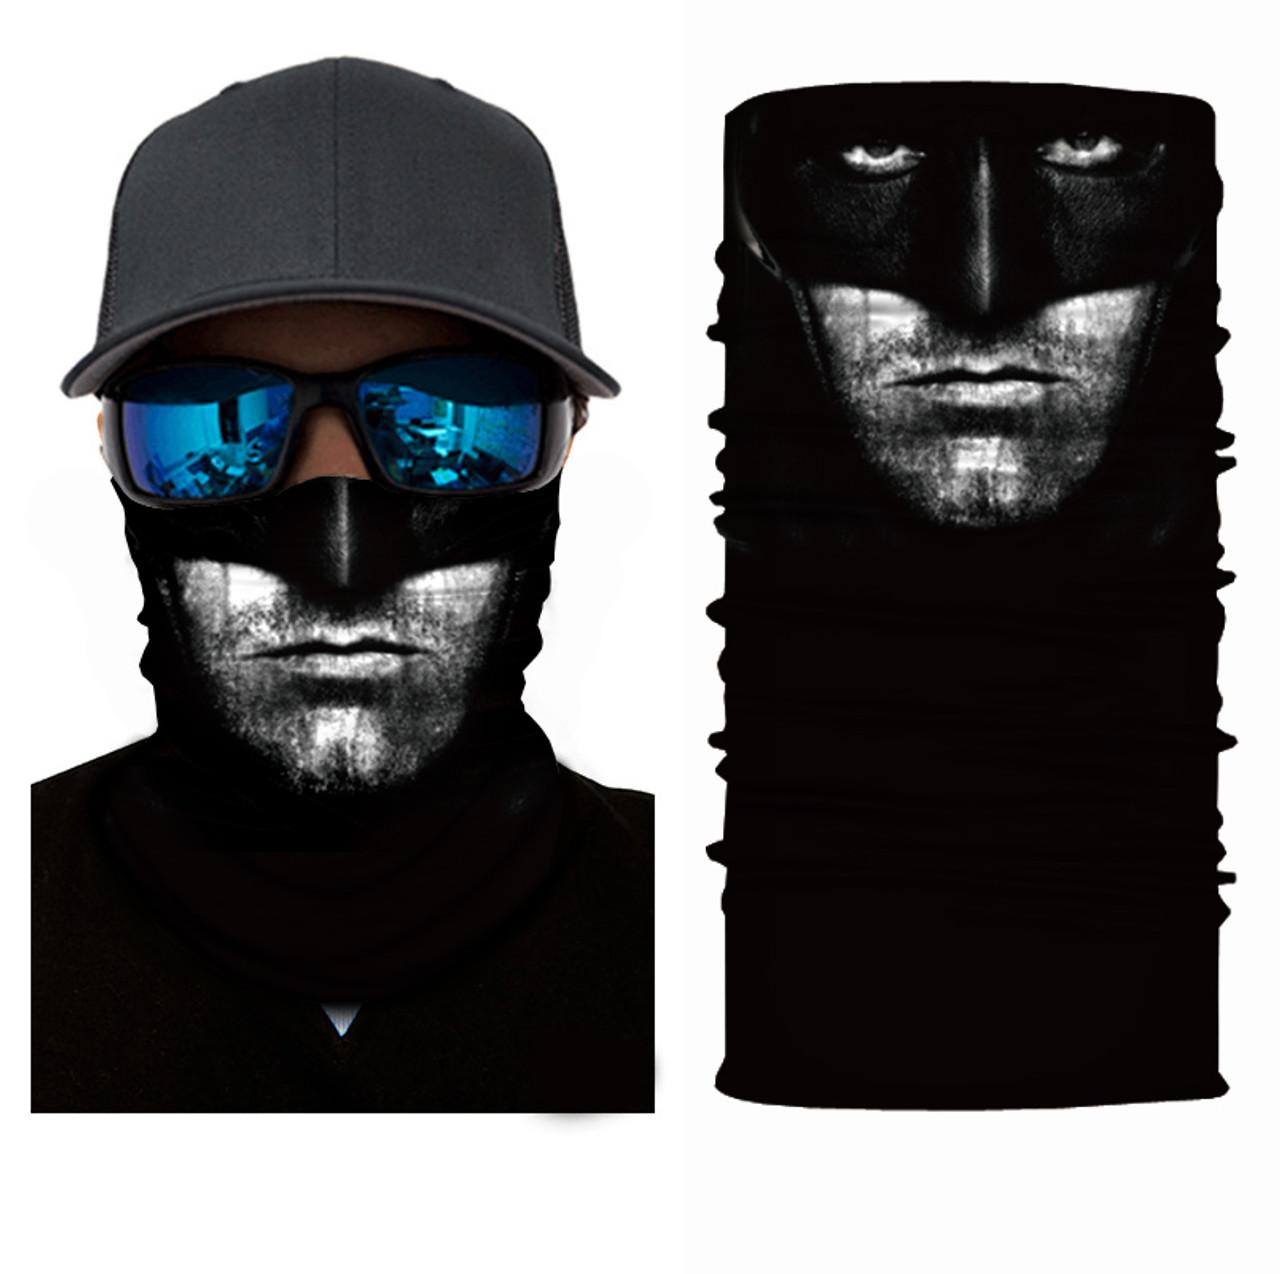 Magic Headwear Abstract Art Outdoor Scarf Headbands Bandana Mask Neck Gaiter Head Wrap Mask Sweatband